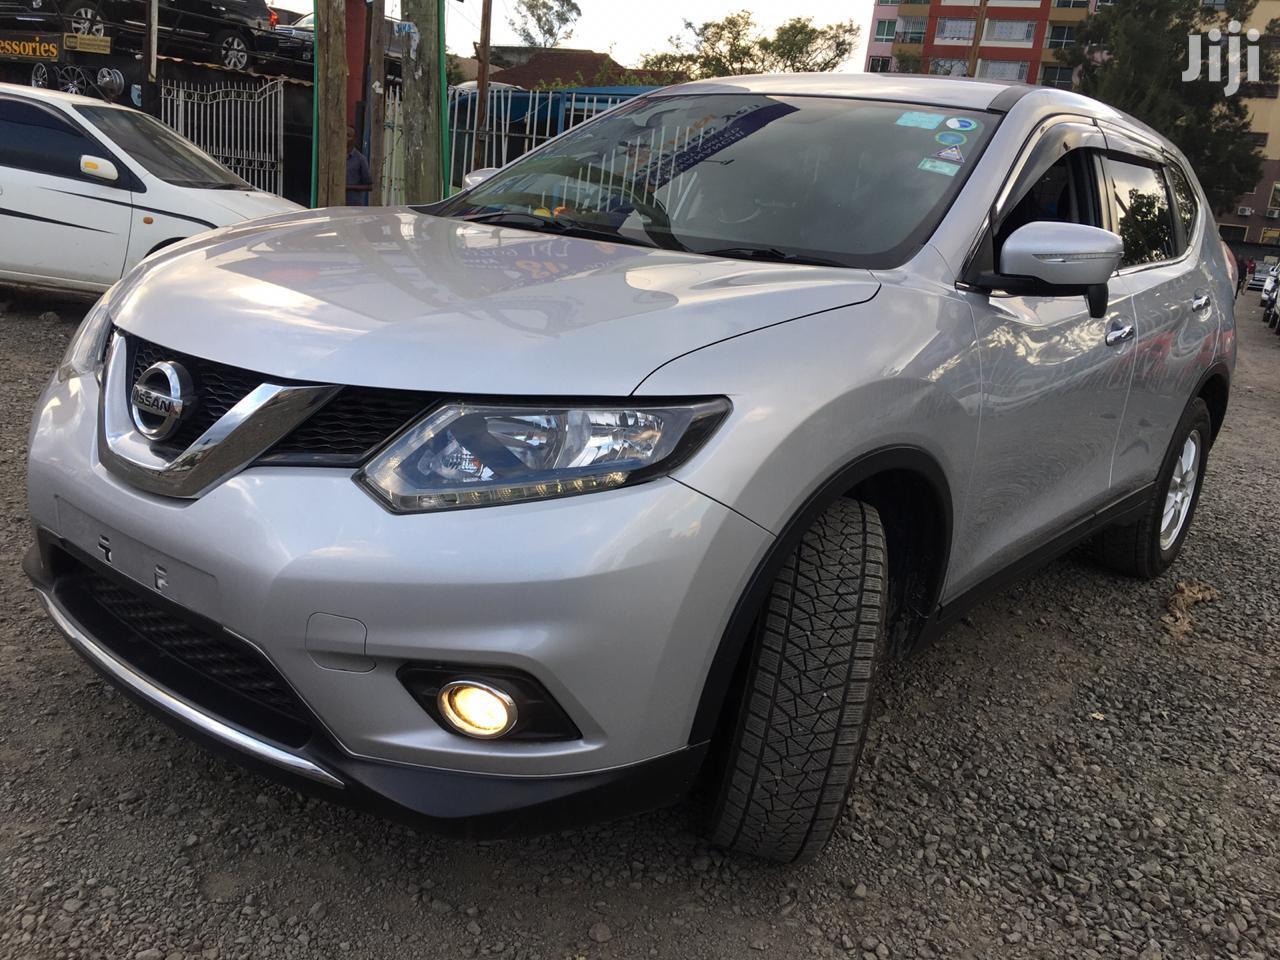 New Nissan X-Trail 2014 Silver | Cars for sale in Makina, Nairobi, Kenya